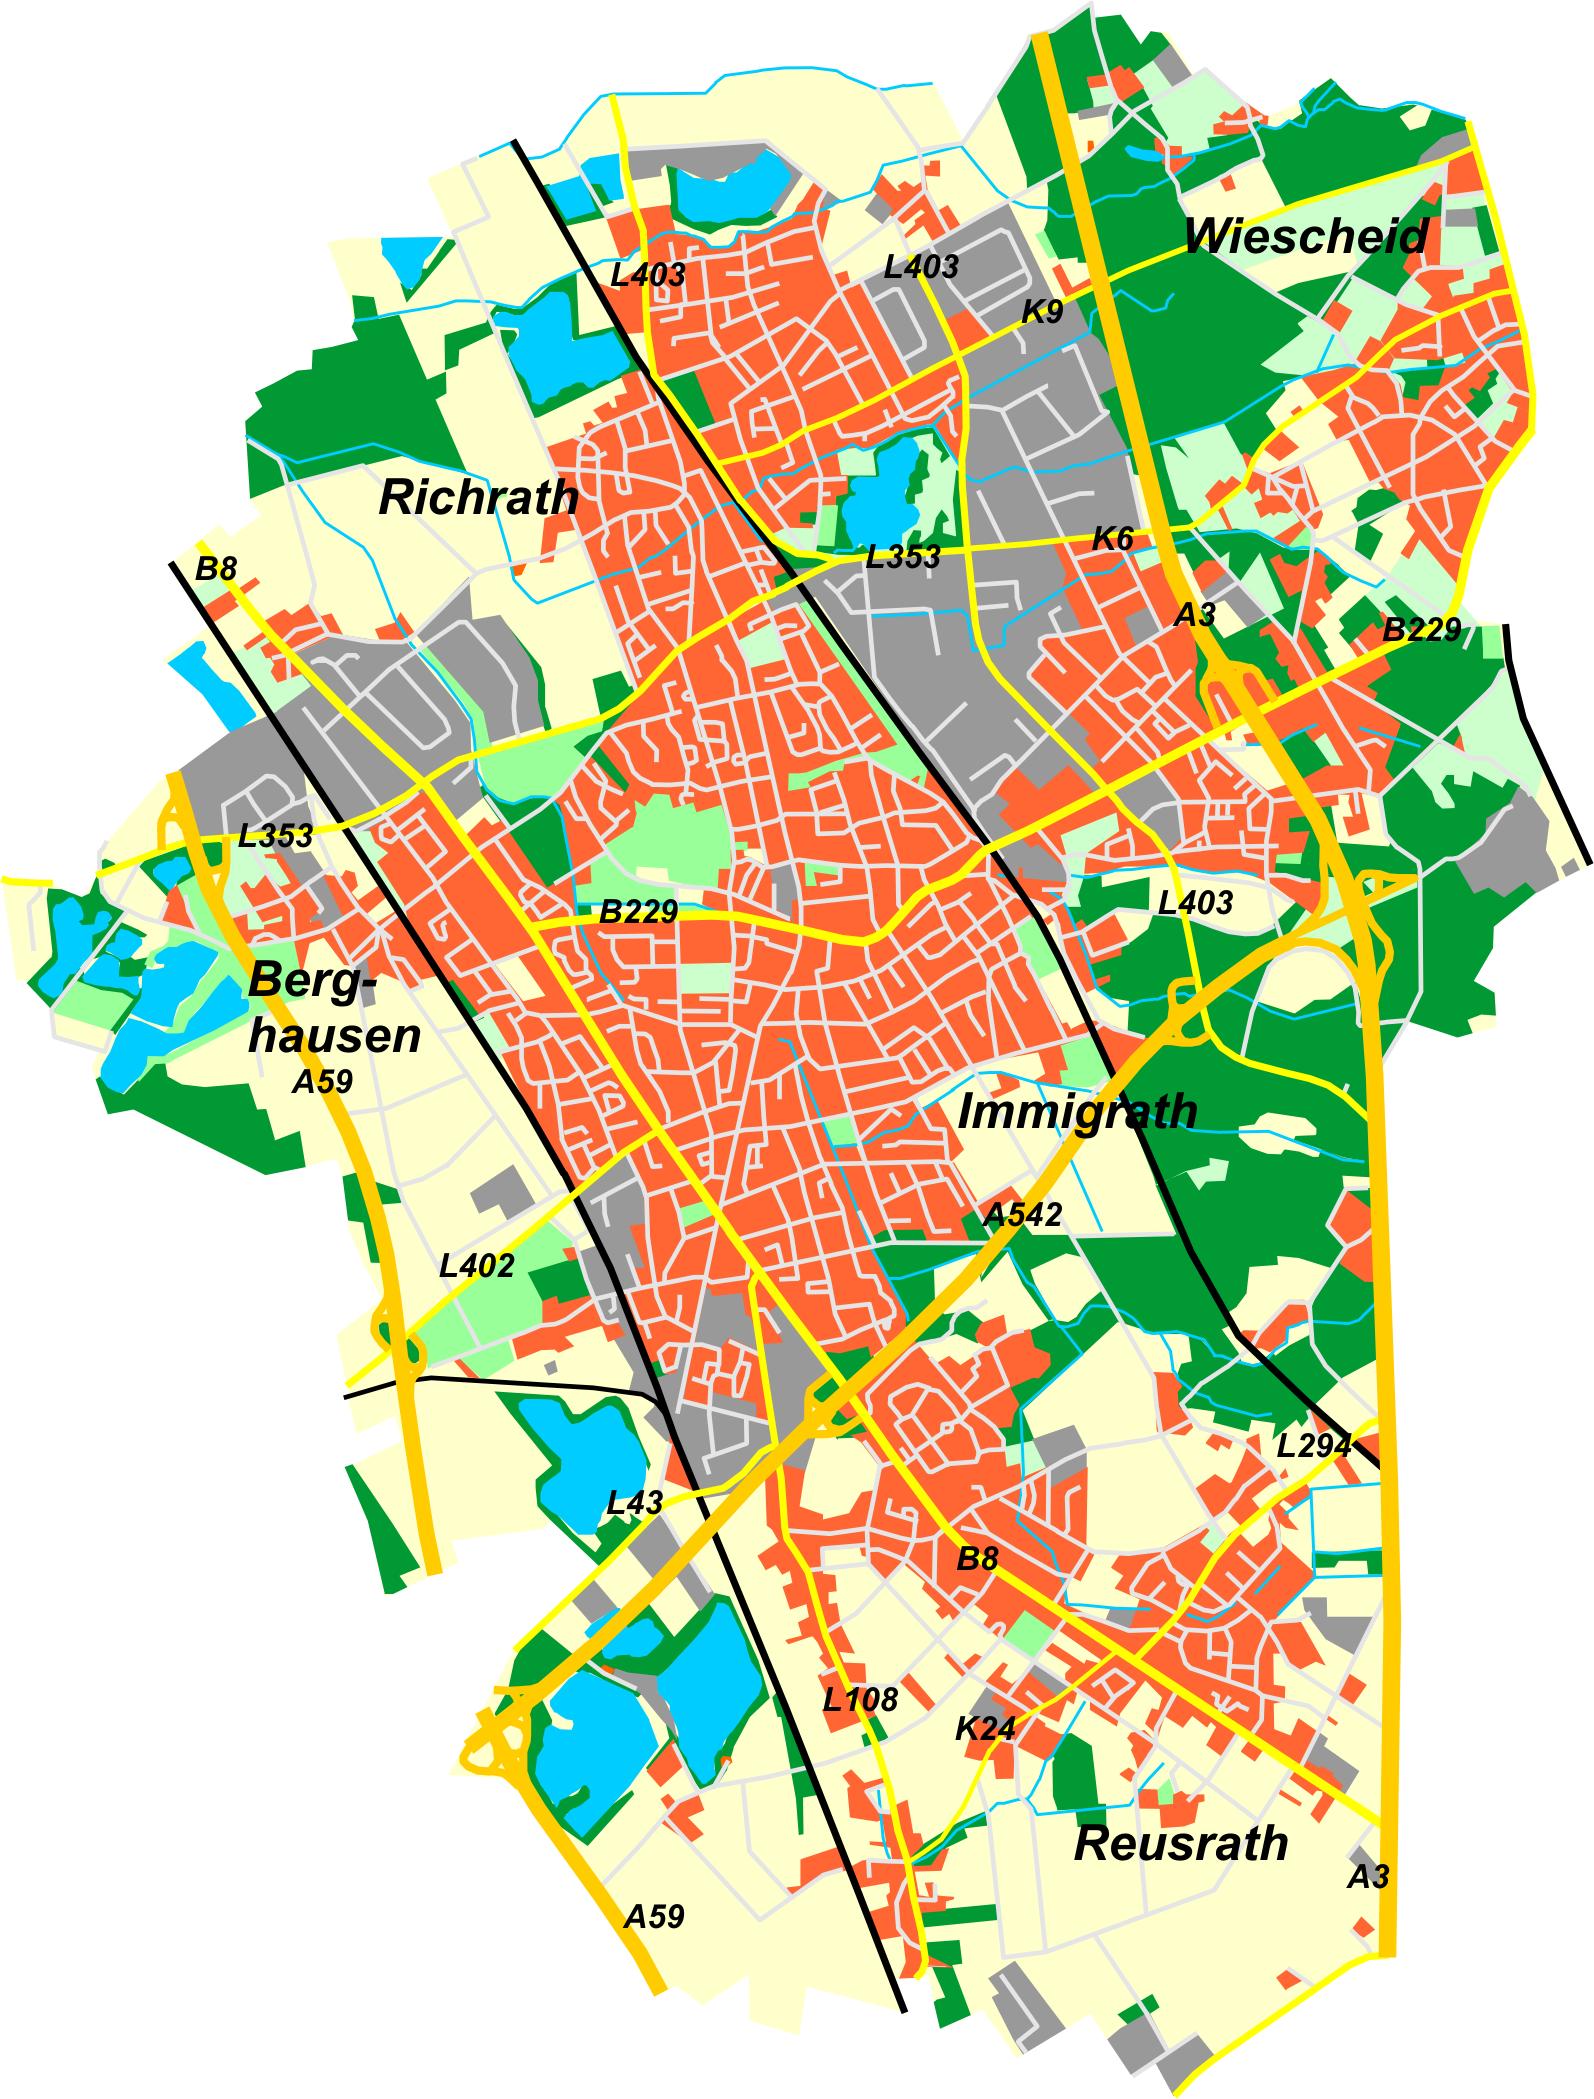 Gartenbau Langenfeld immigrath